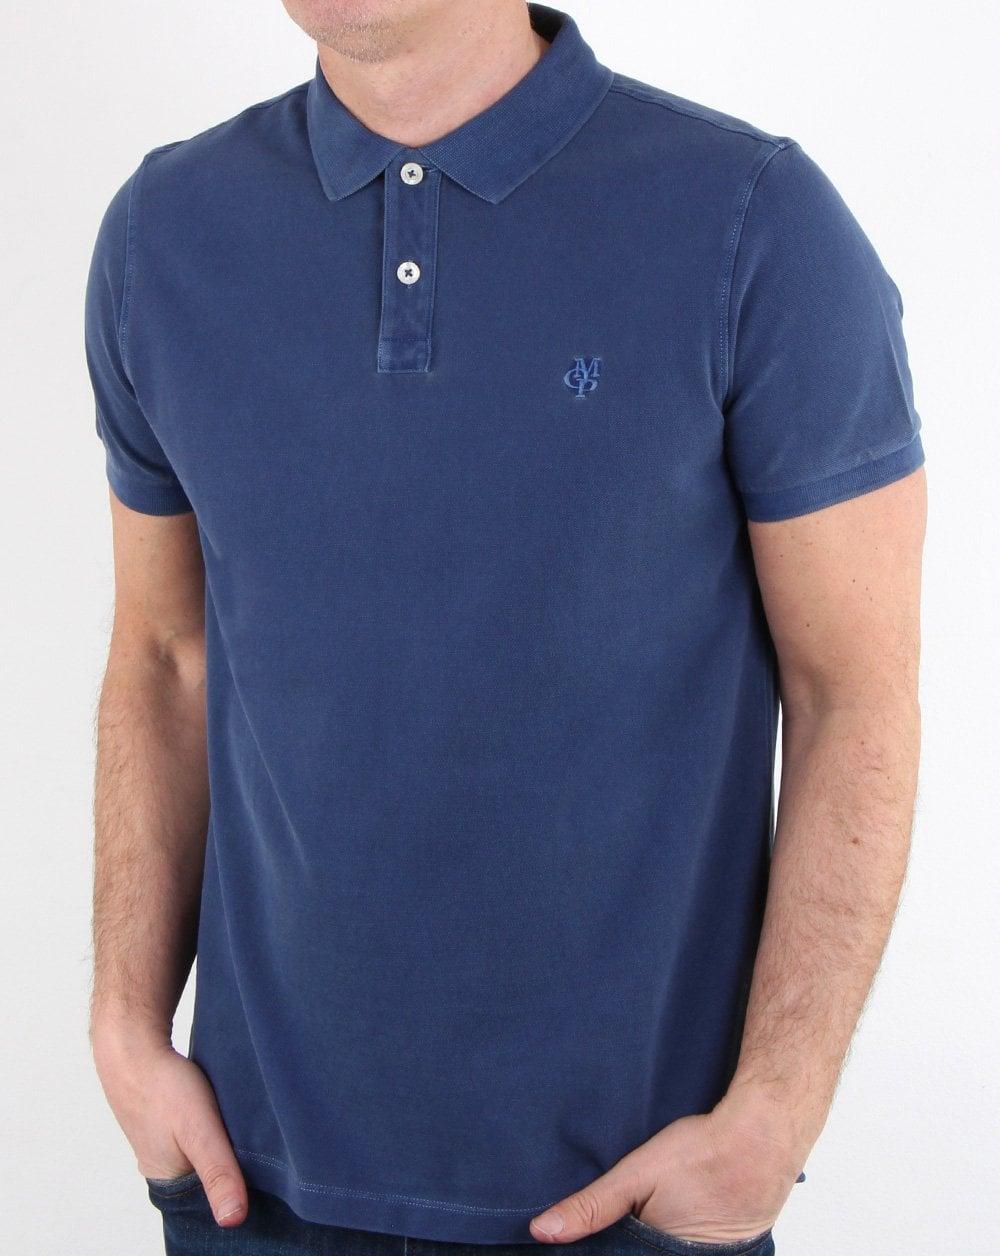 Marc O'Polo Hemden in Grau |